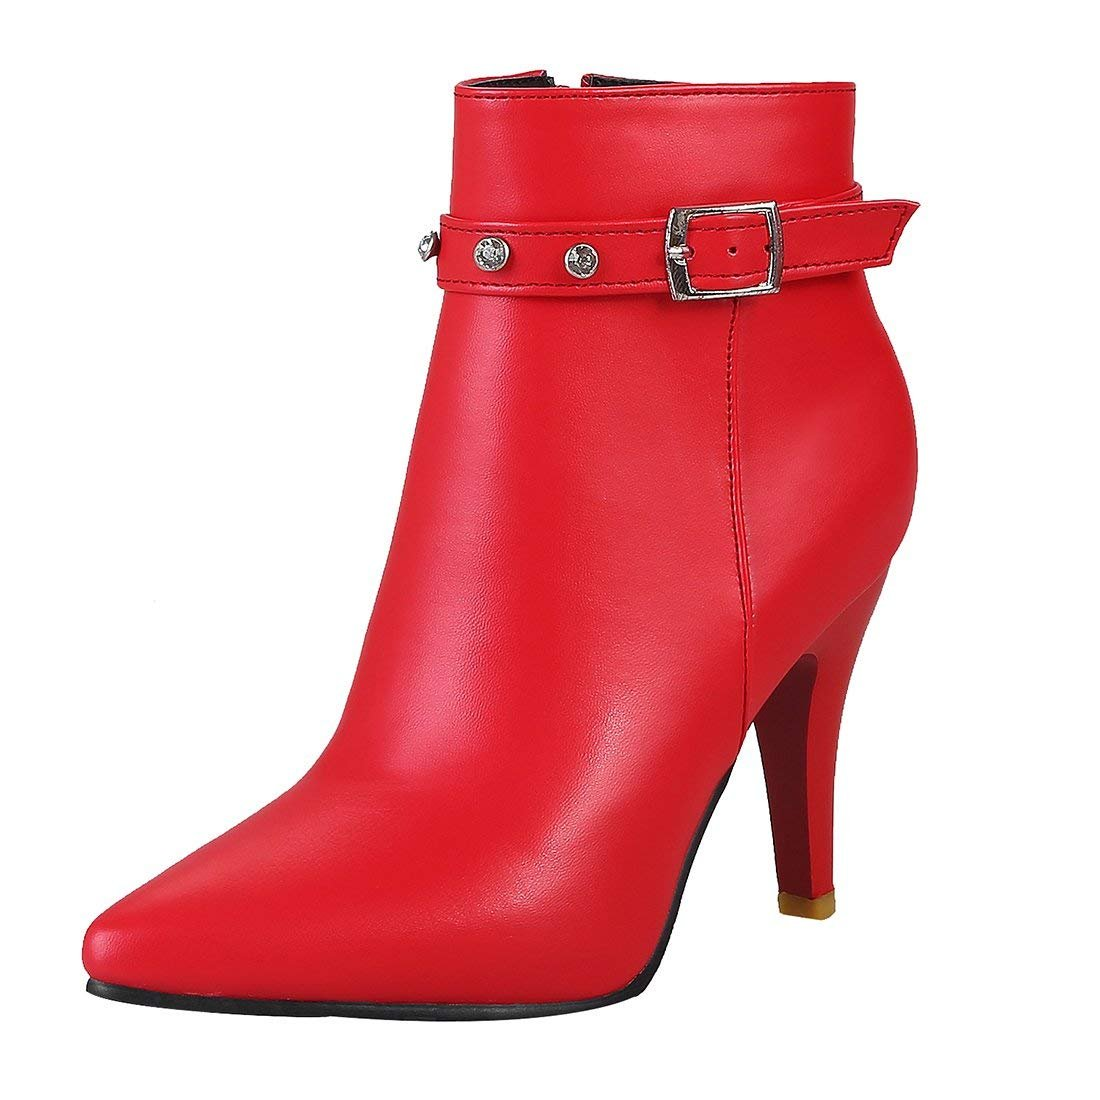 YE Bottine Sexy Strass Femme Talon Haut Aiguille Bottes Zip Chaussure  Hiver  Amazon.fr  Chaussures et Sacs 55f289337086